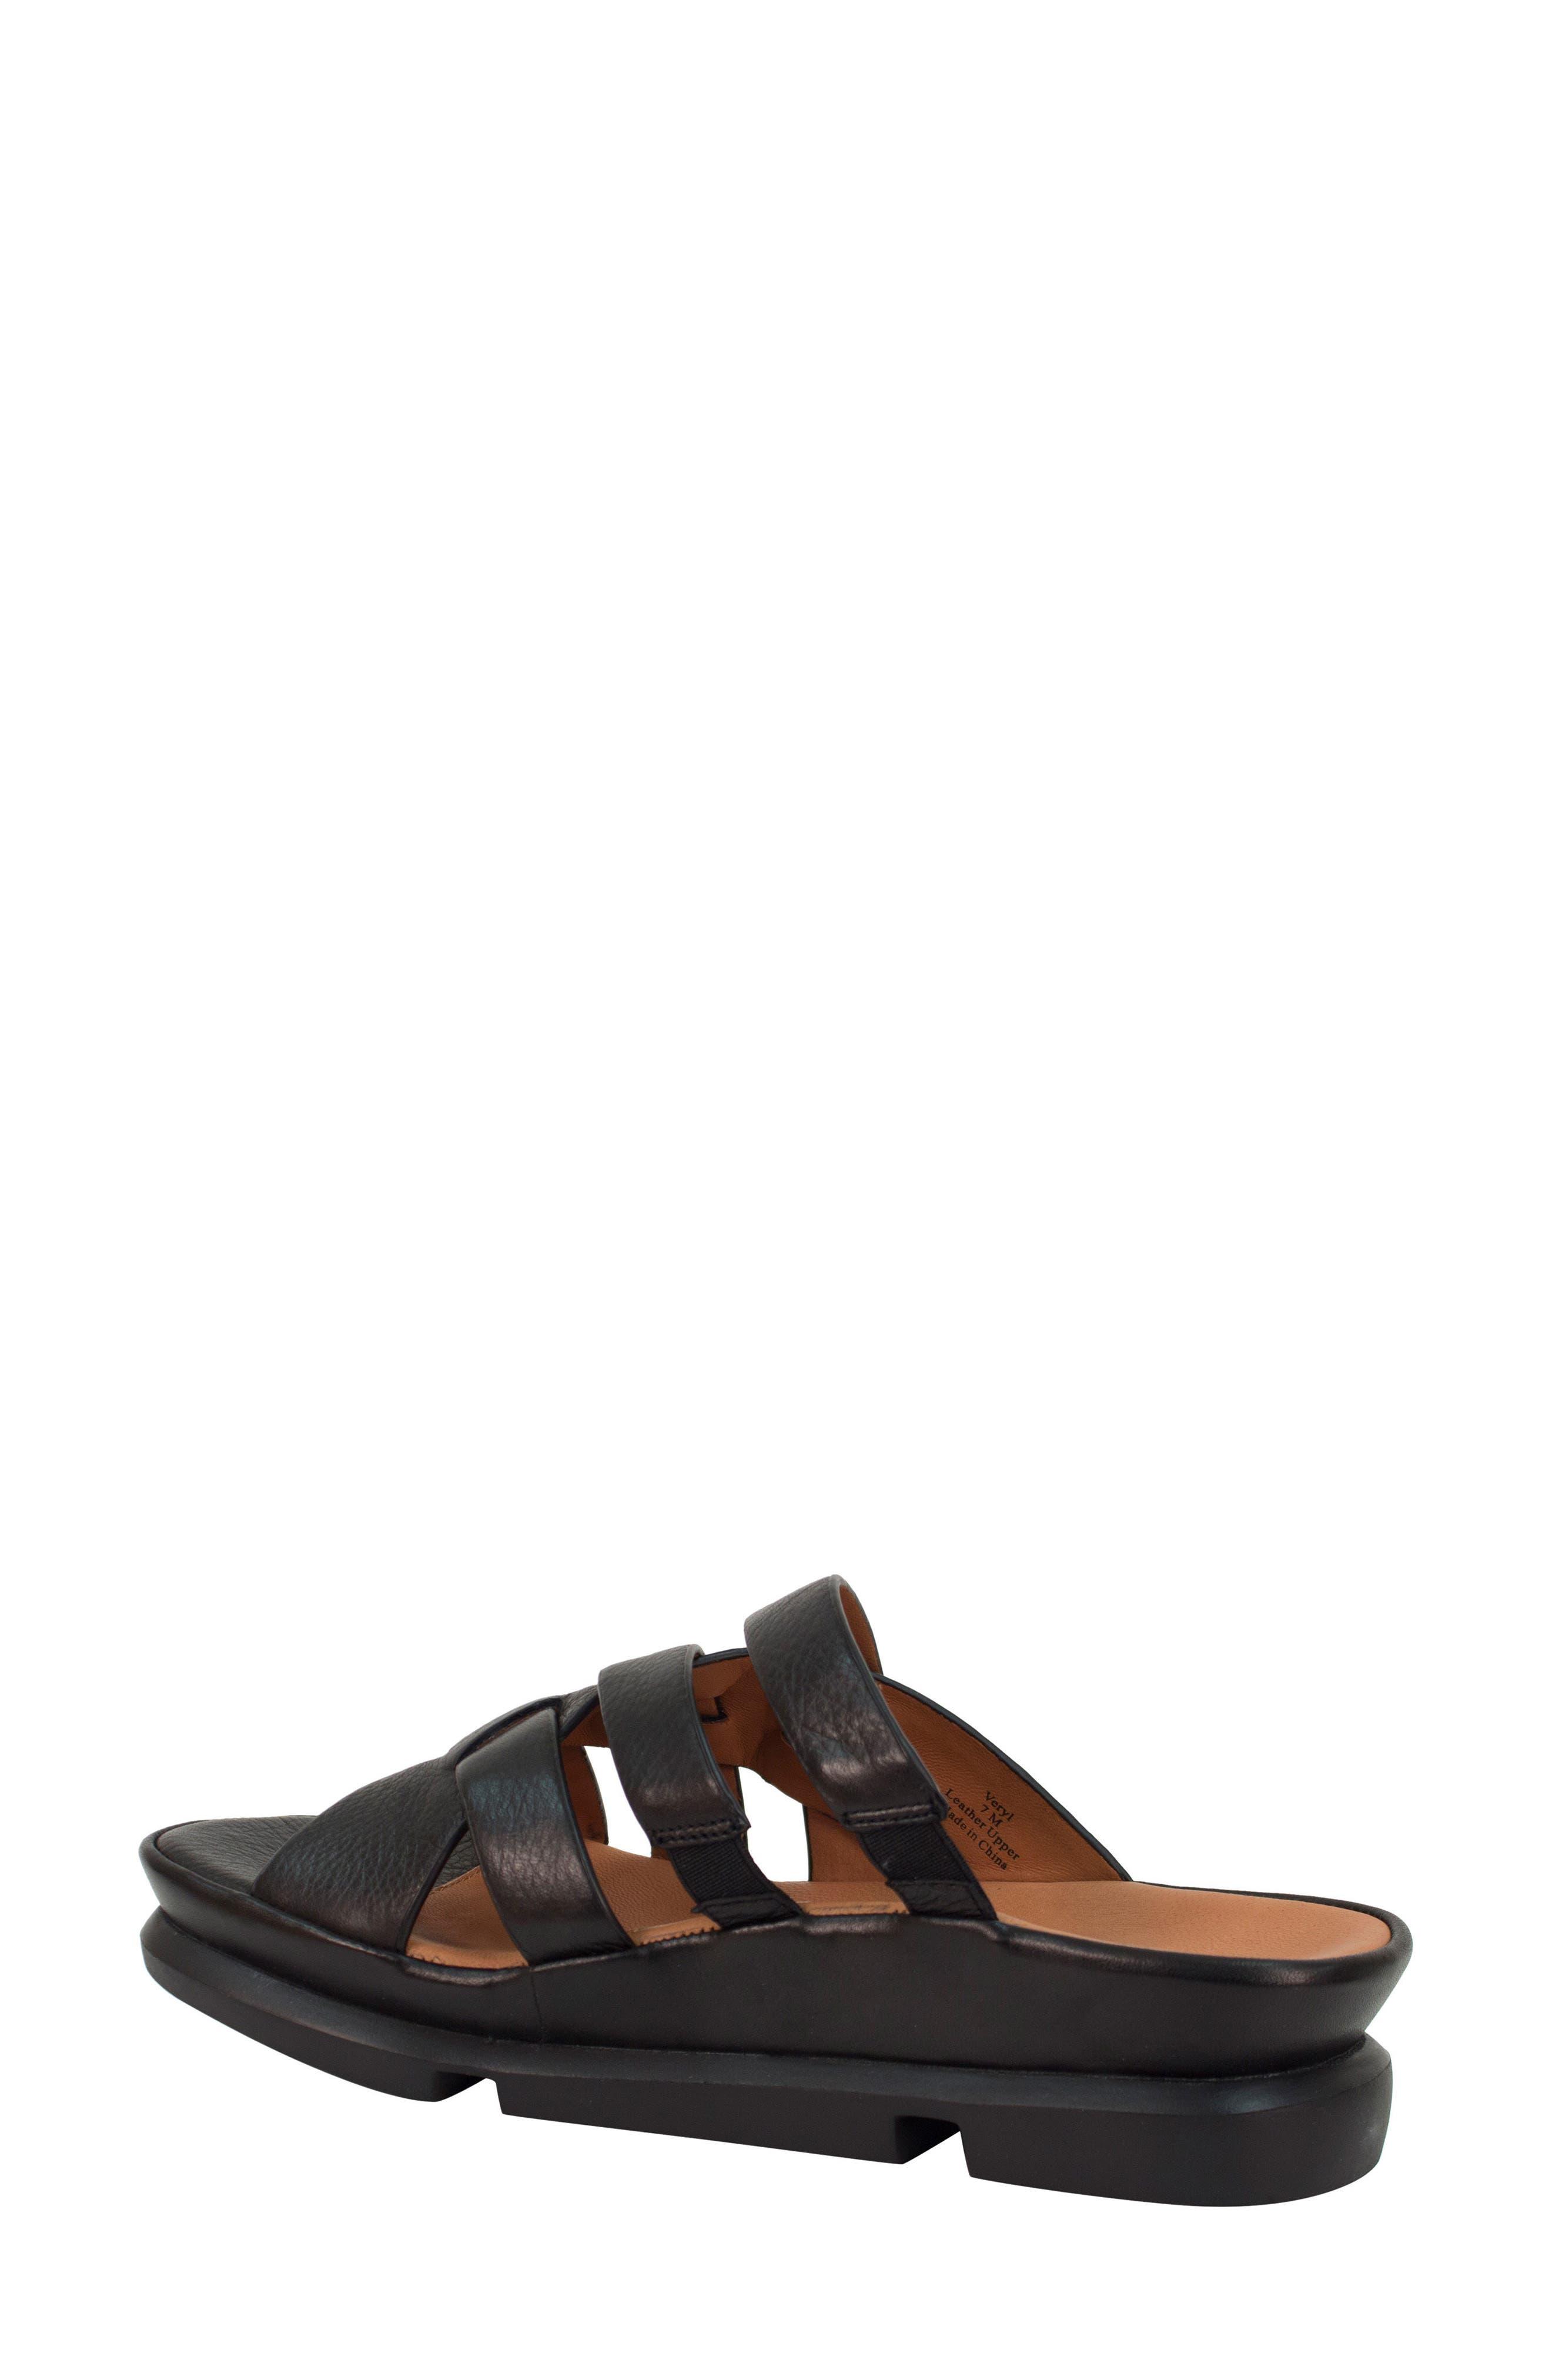 Veryl Sandal,                             Alternate thumbnail 2, color,                             Black Leather